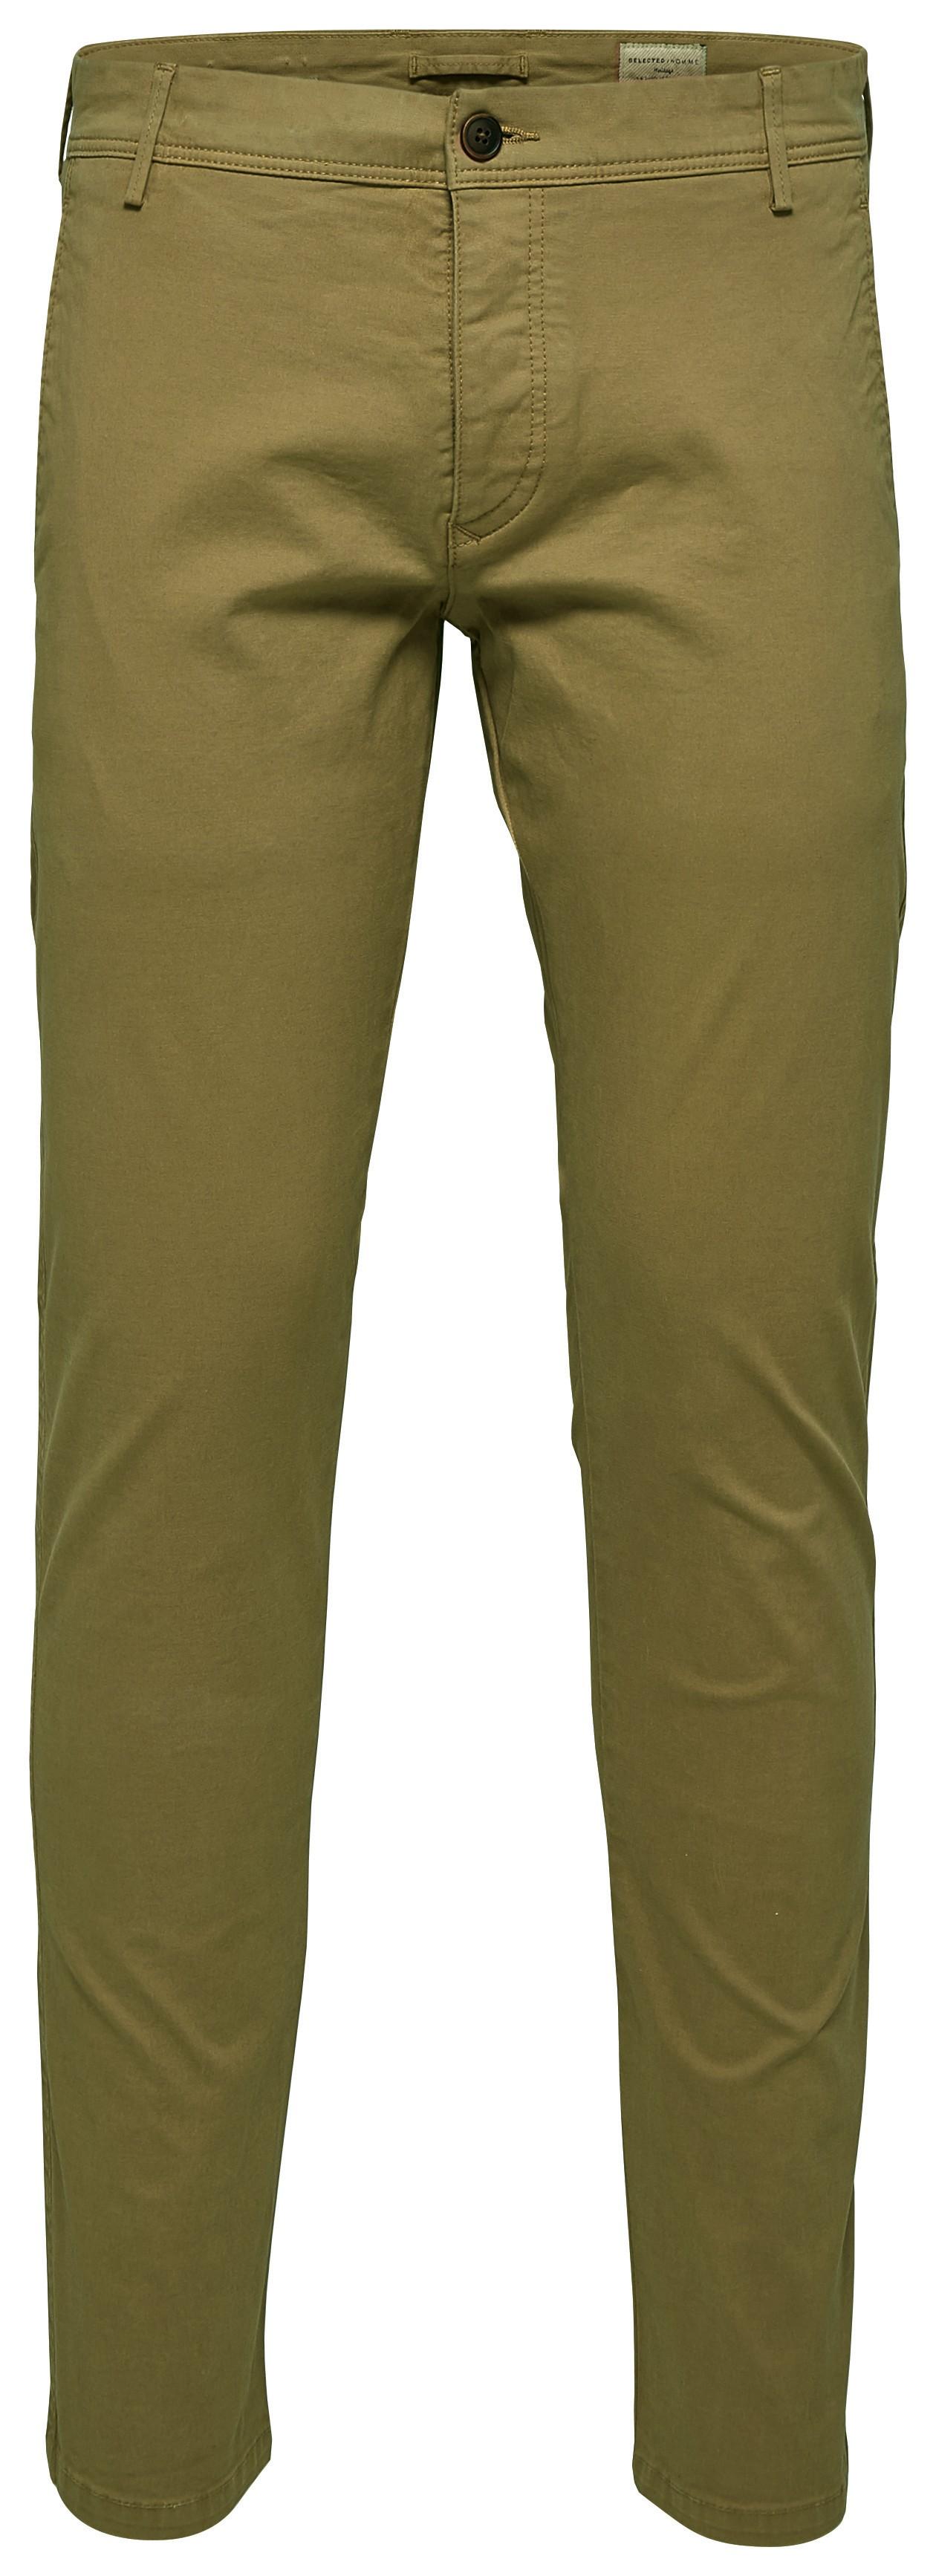 Selected homme | Pantalon chino vert olive coupe ajustée